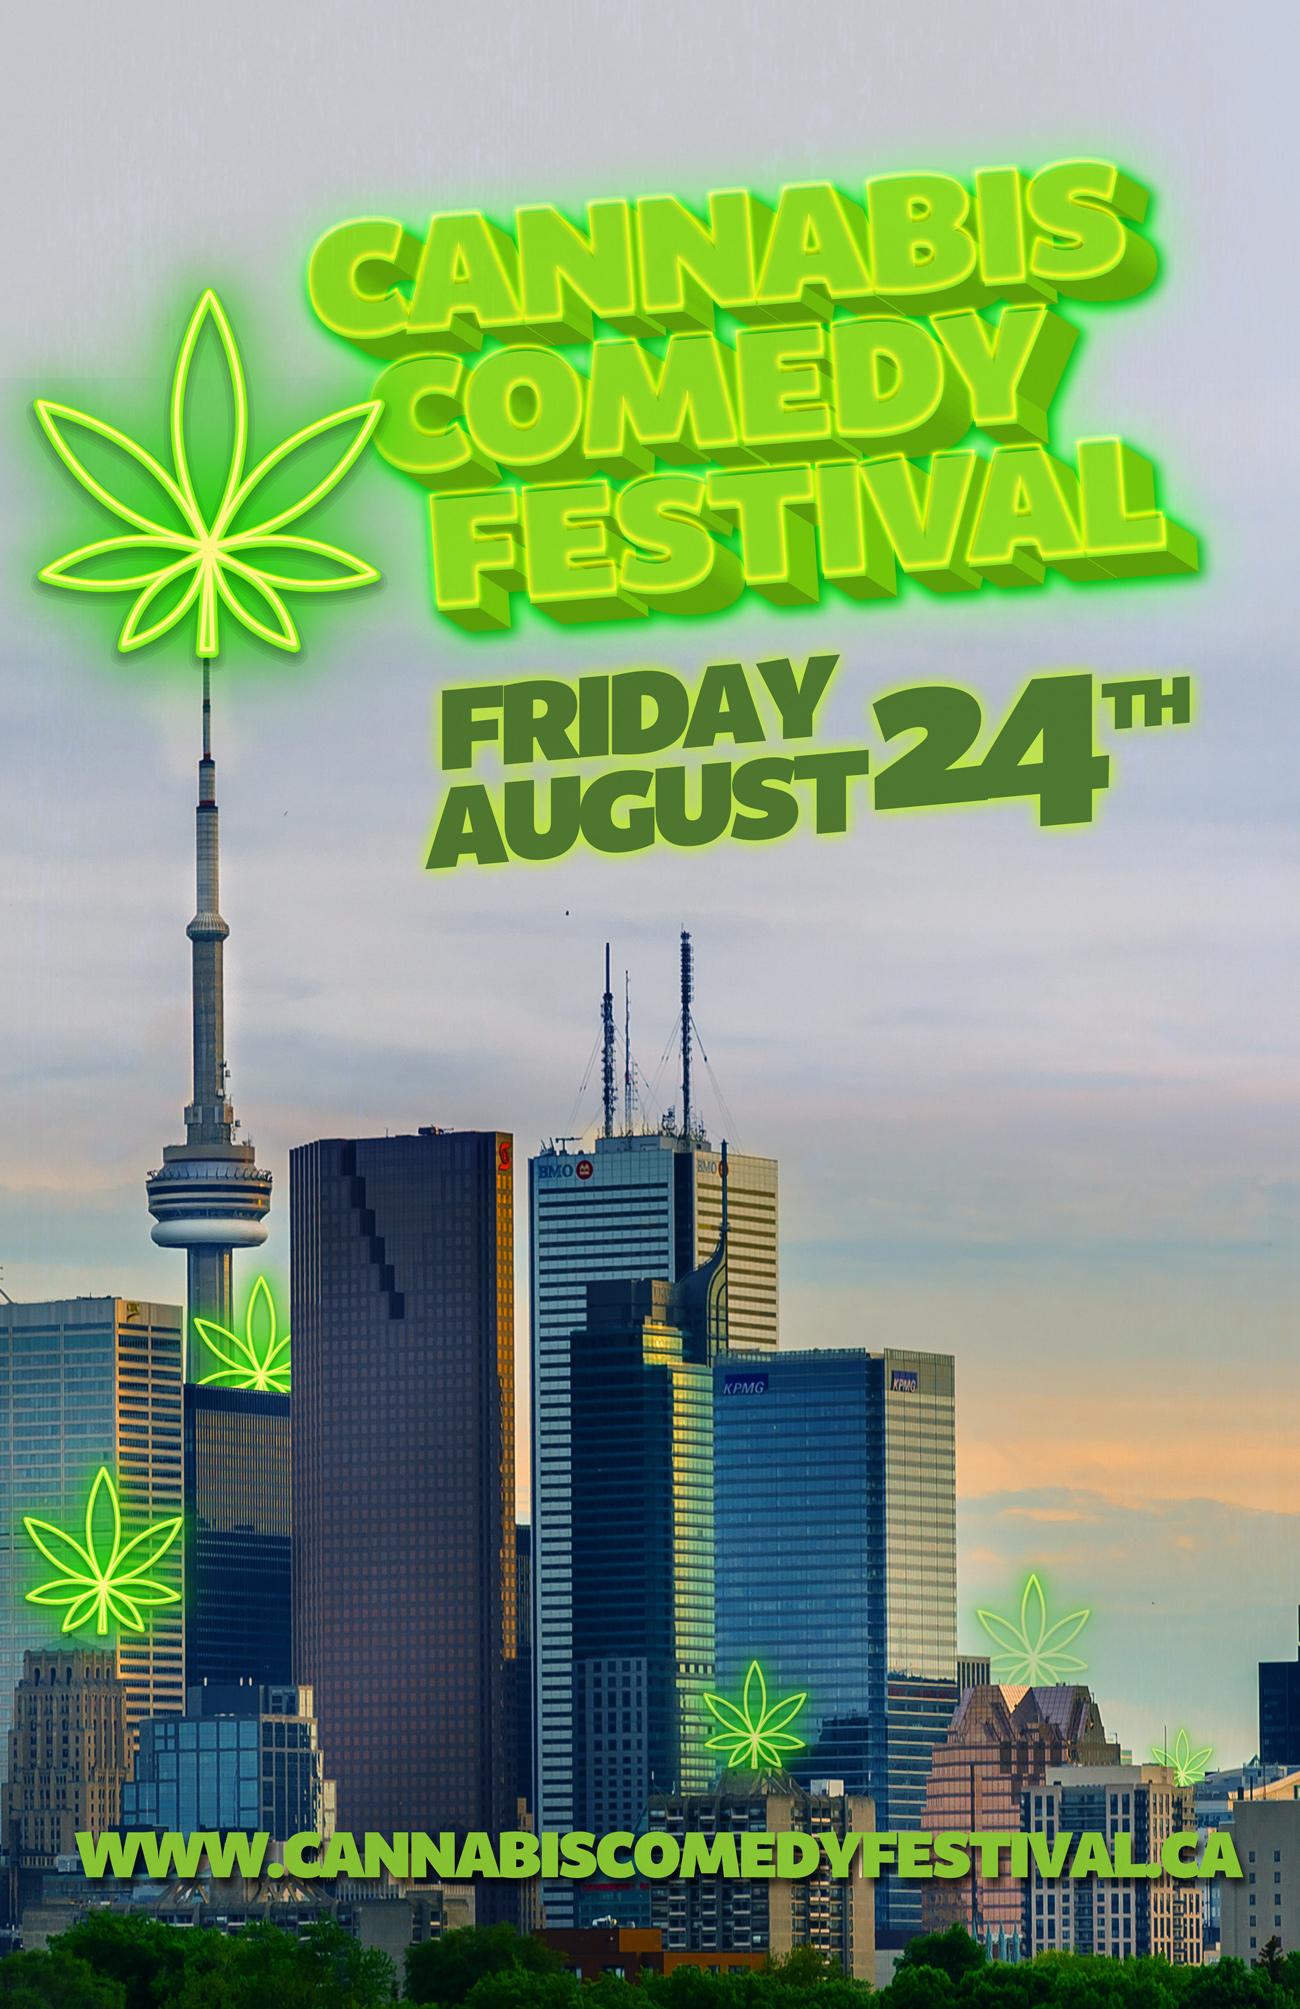 Cannabis Comedy Festival